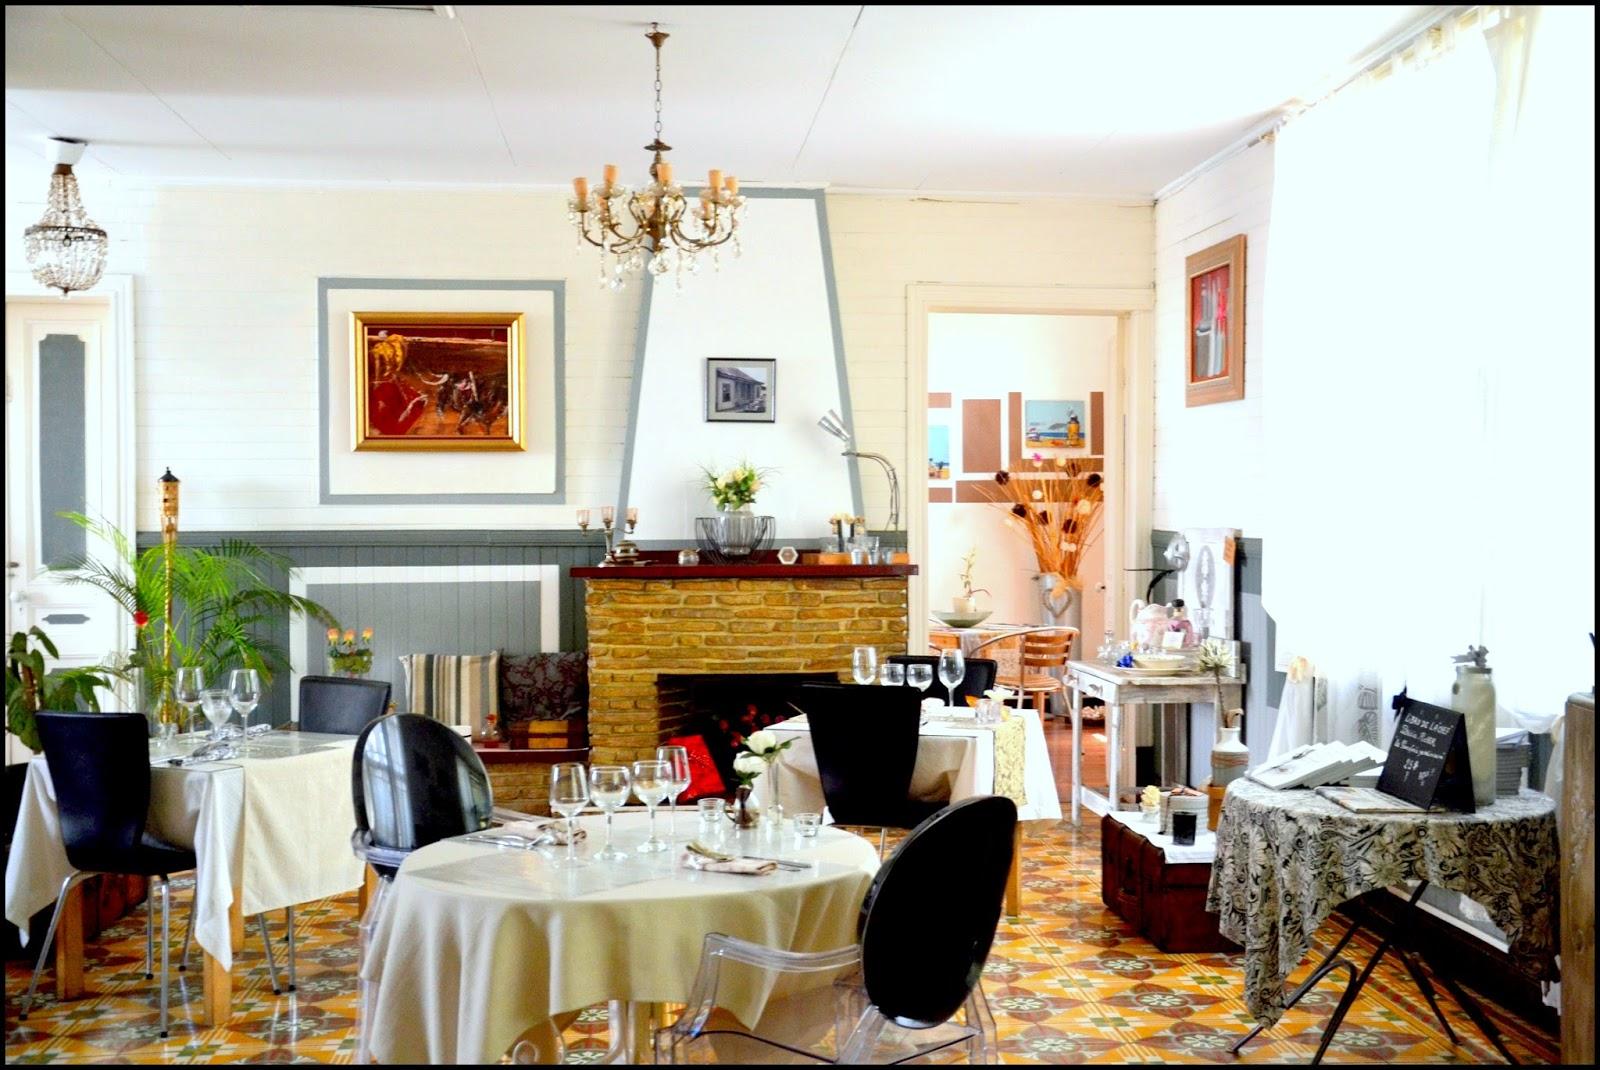 La Terrasse French Cuisine The Restaurant La Terrasse In